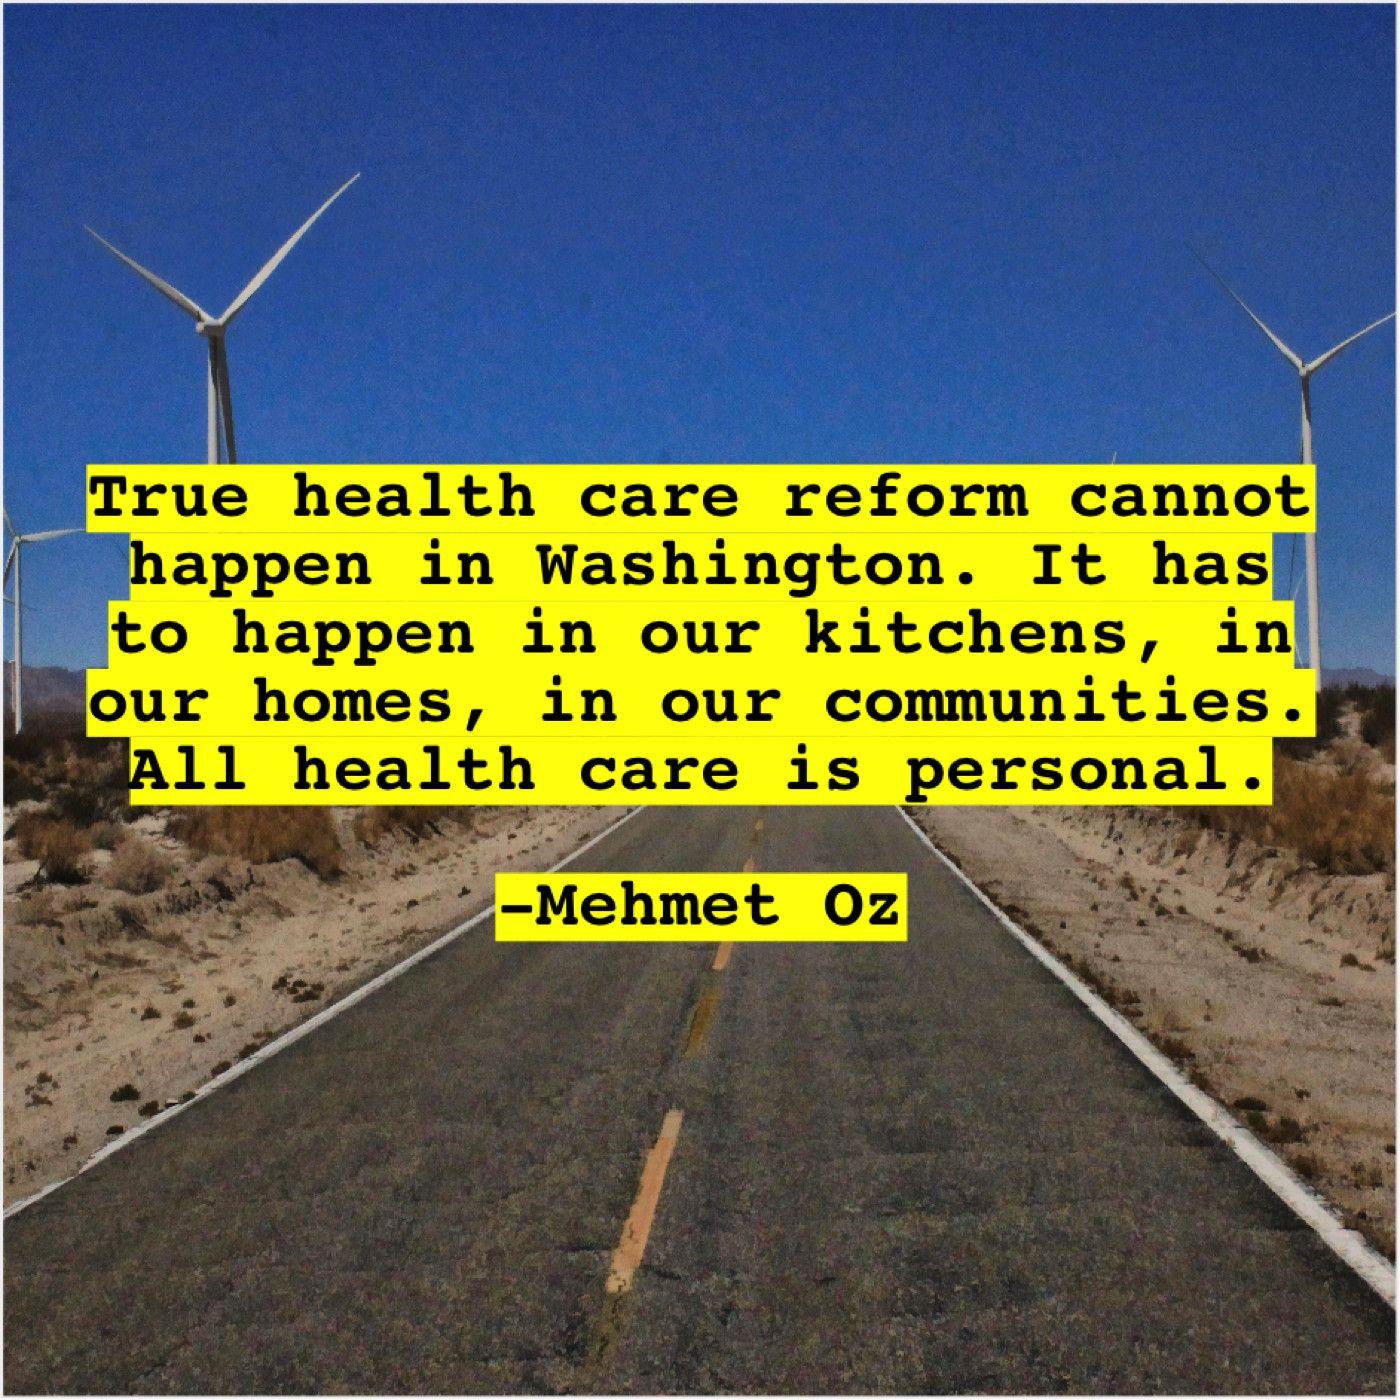 Get More Free Quotes Click The Image Mehmet Oz True health